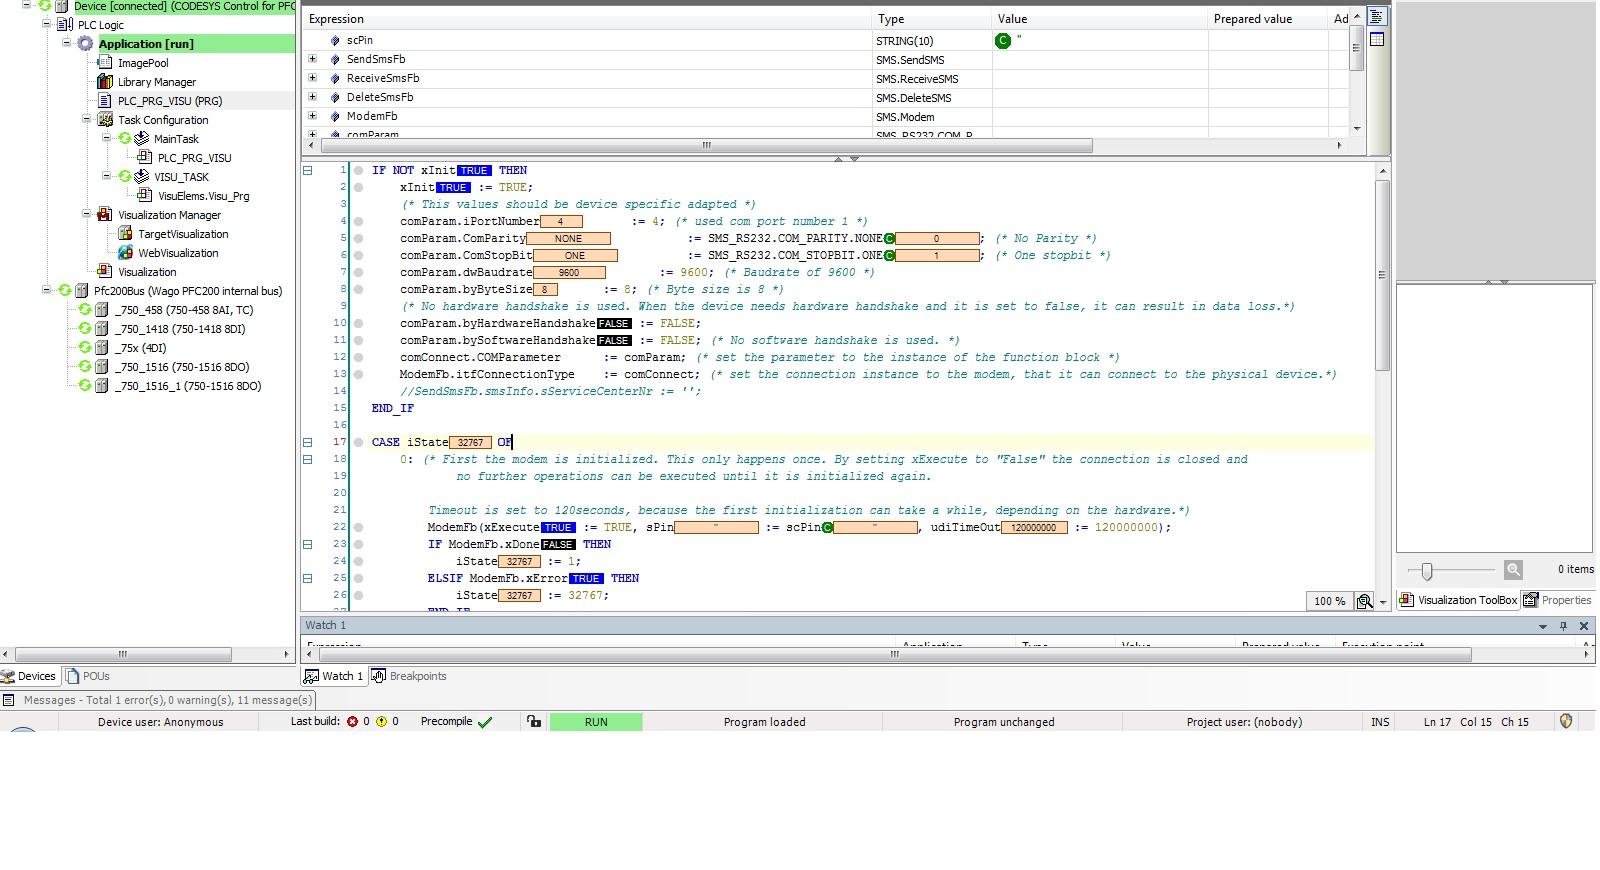 IMG: codesyss.jpg